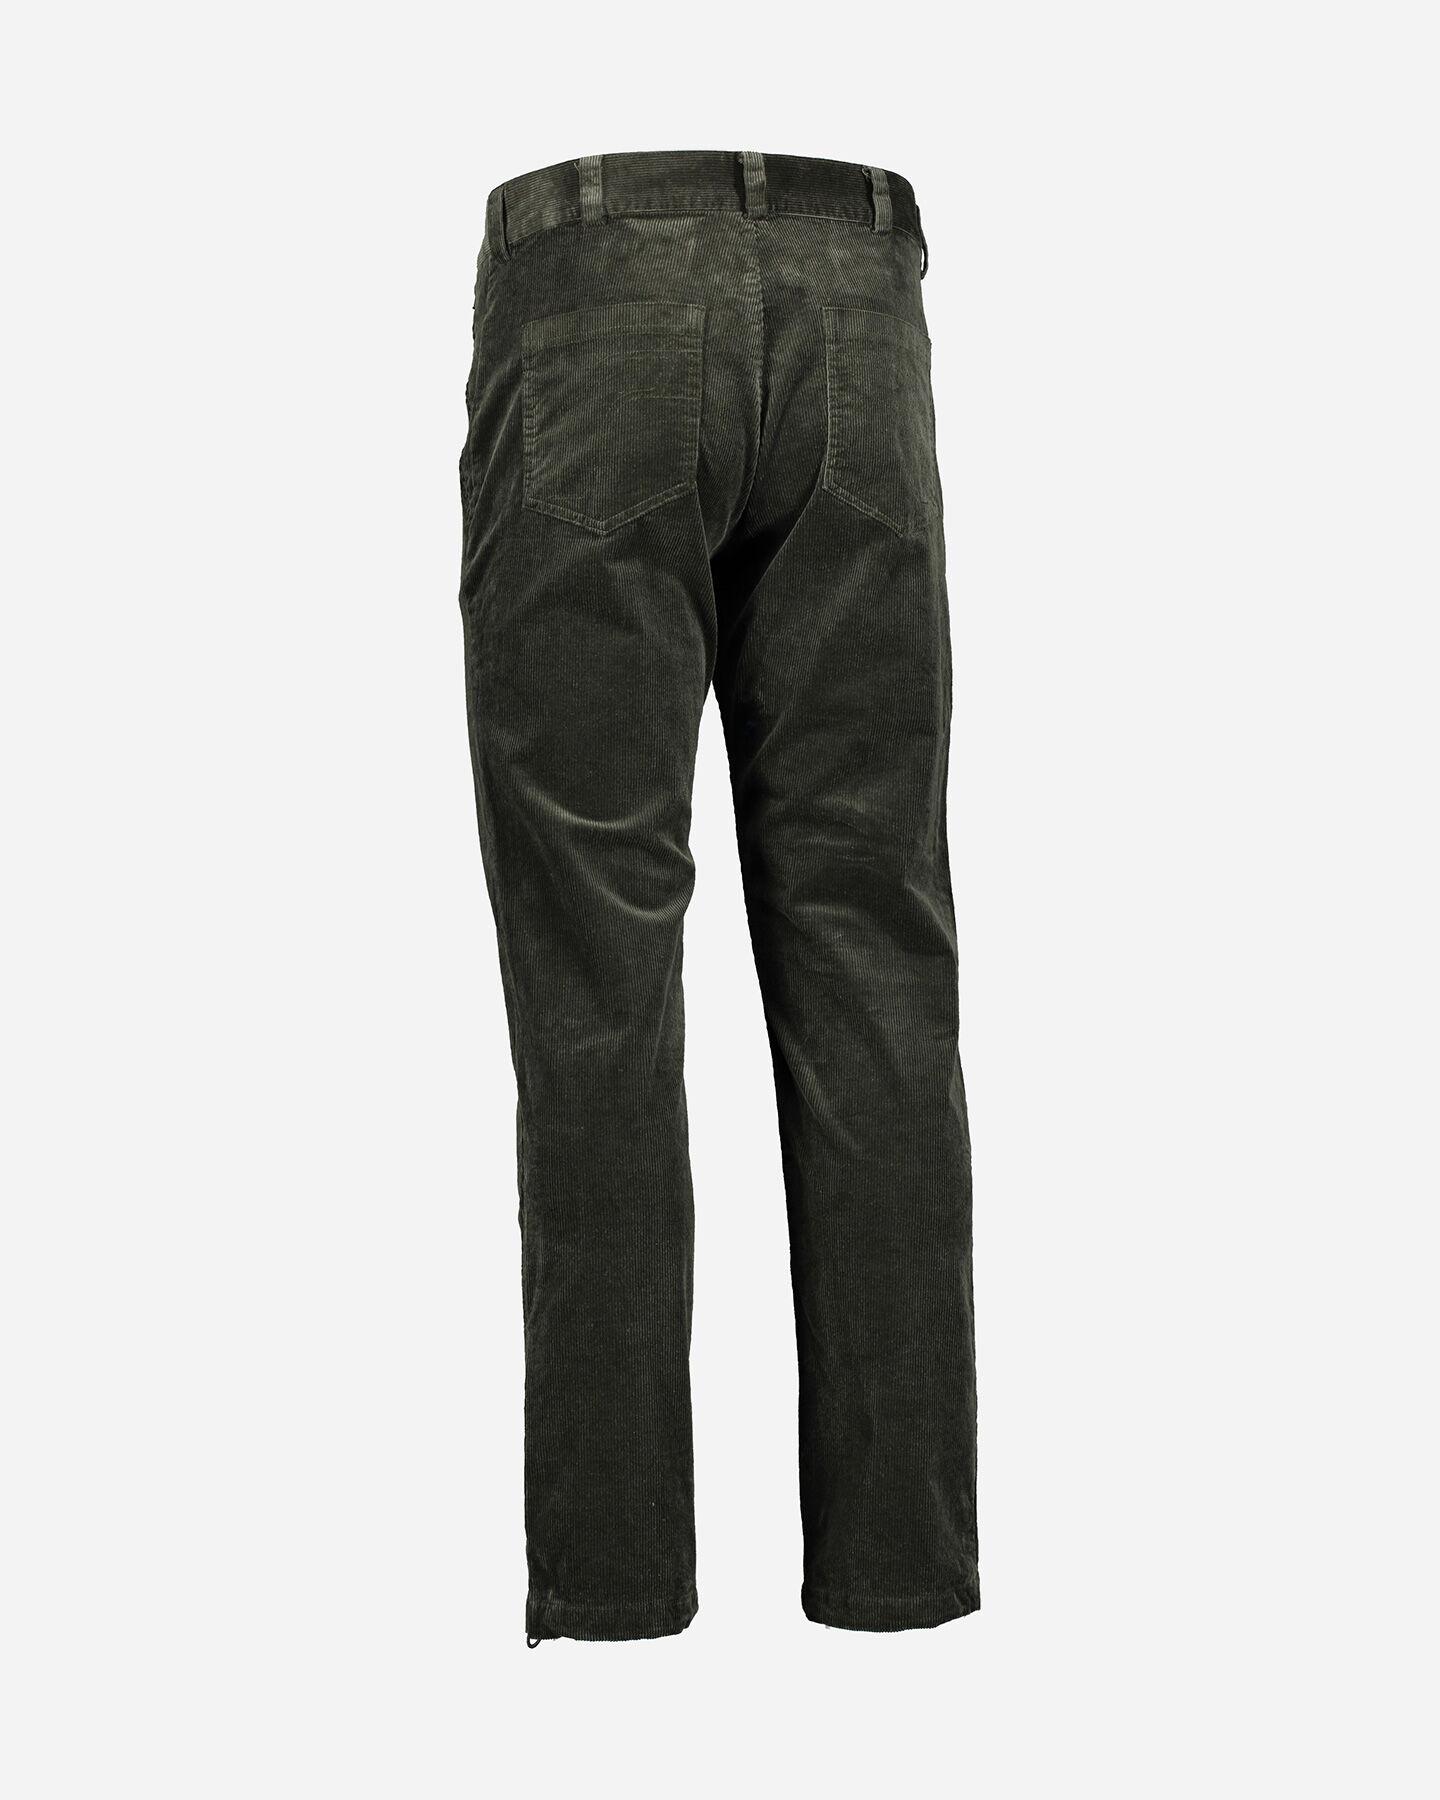 Pantalone outdoor REUSCH VELVET M S4081965 scatto 1